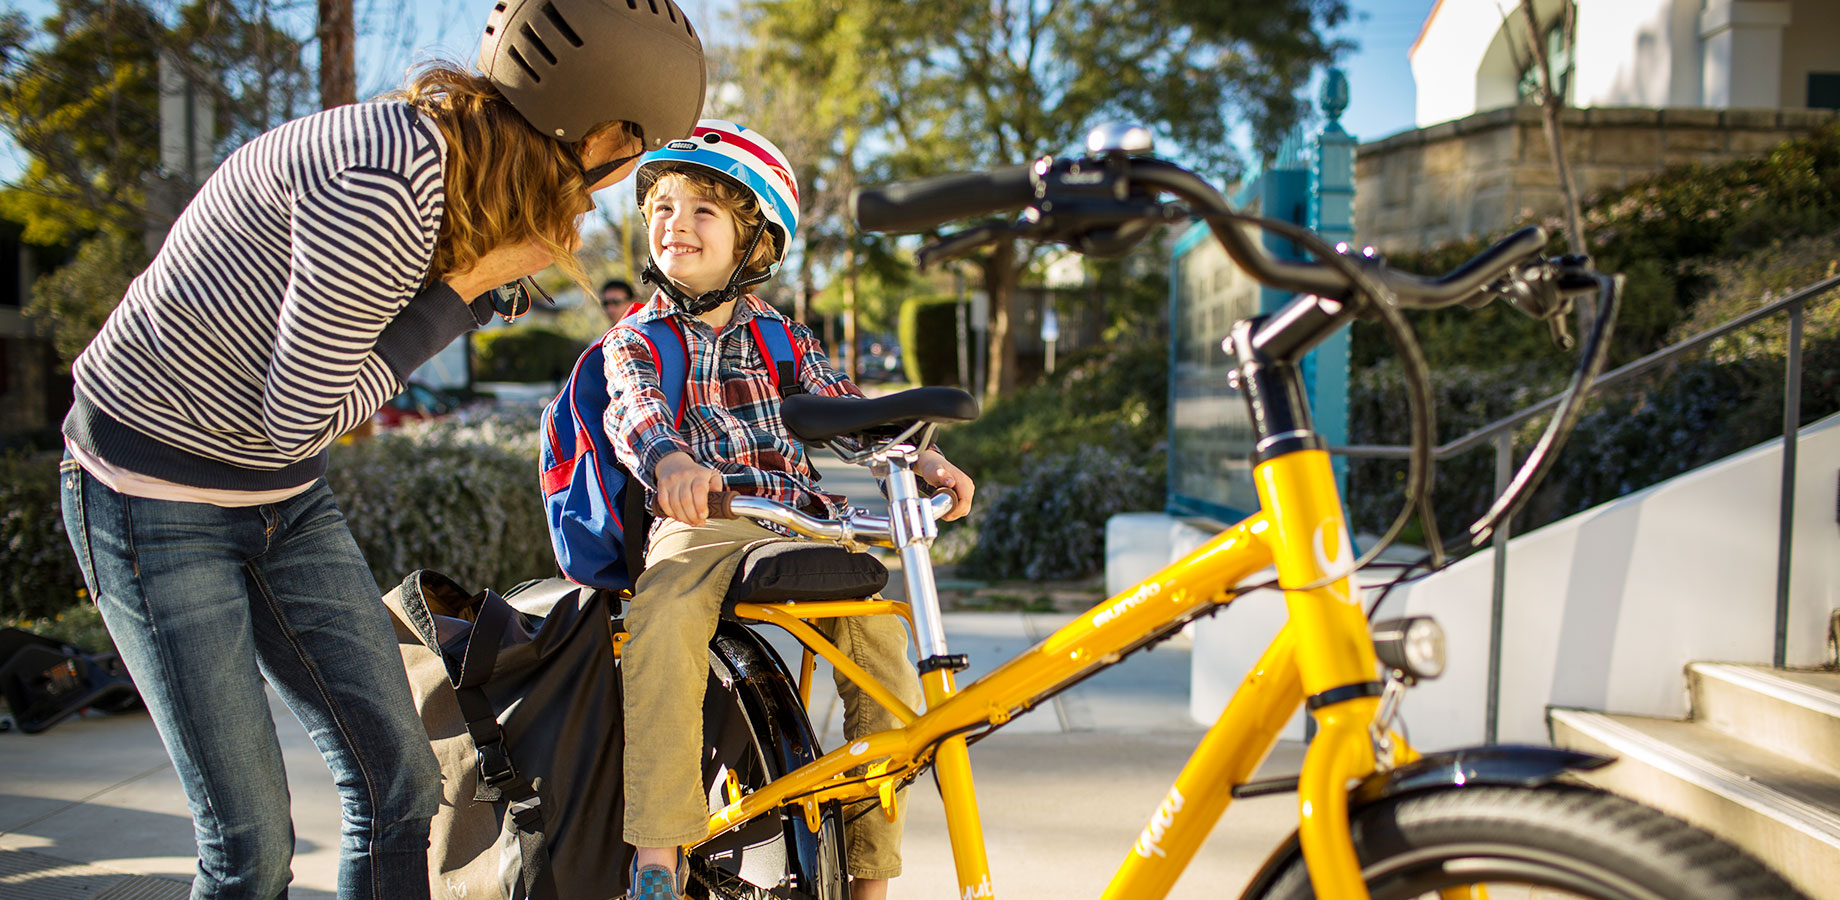 Lastenrad für Kinder